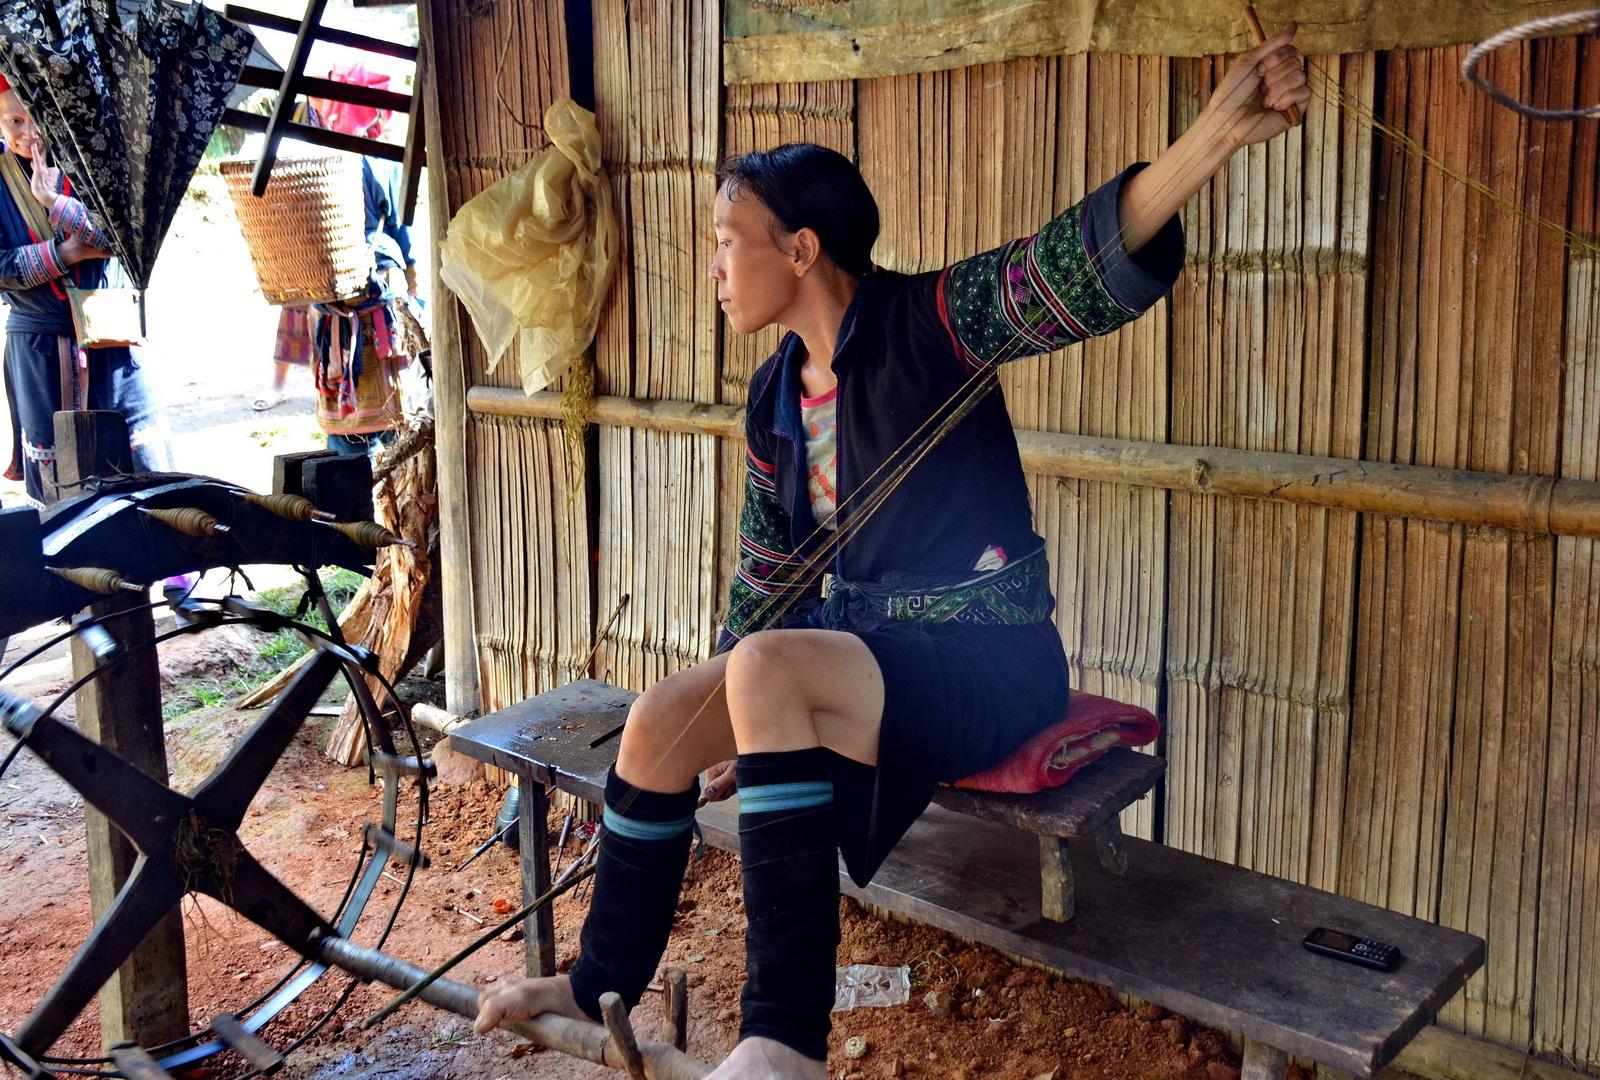 Black Hmong girl weaving hemp